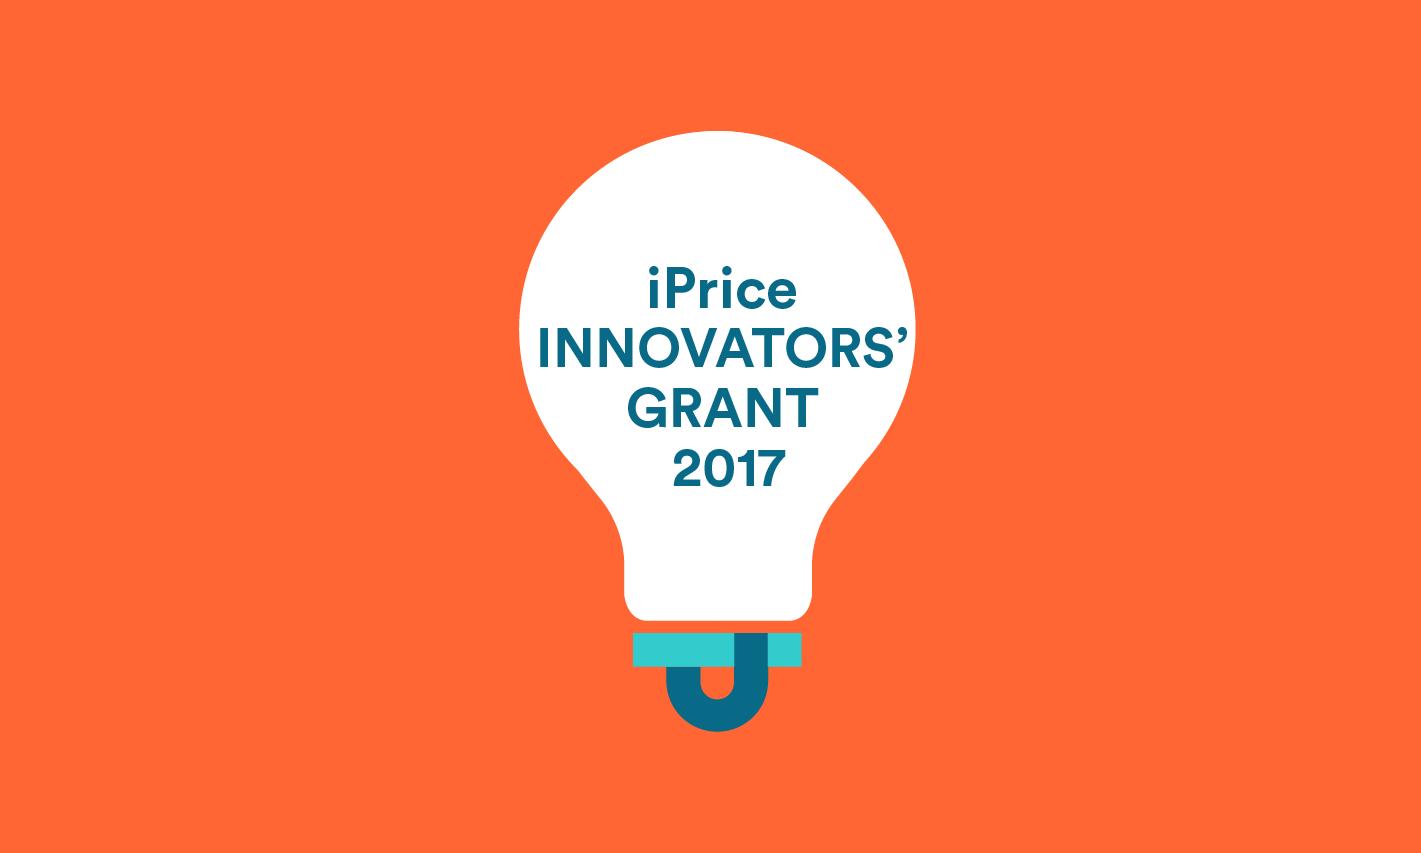 hoc-bong-iprice-innovators-grant-2017.jp